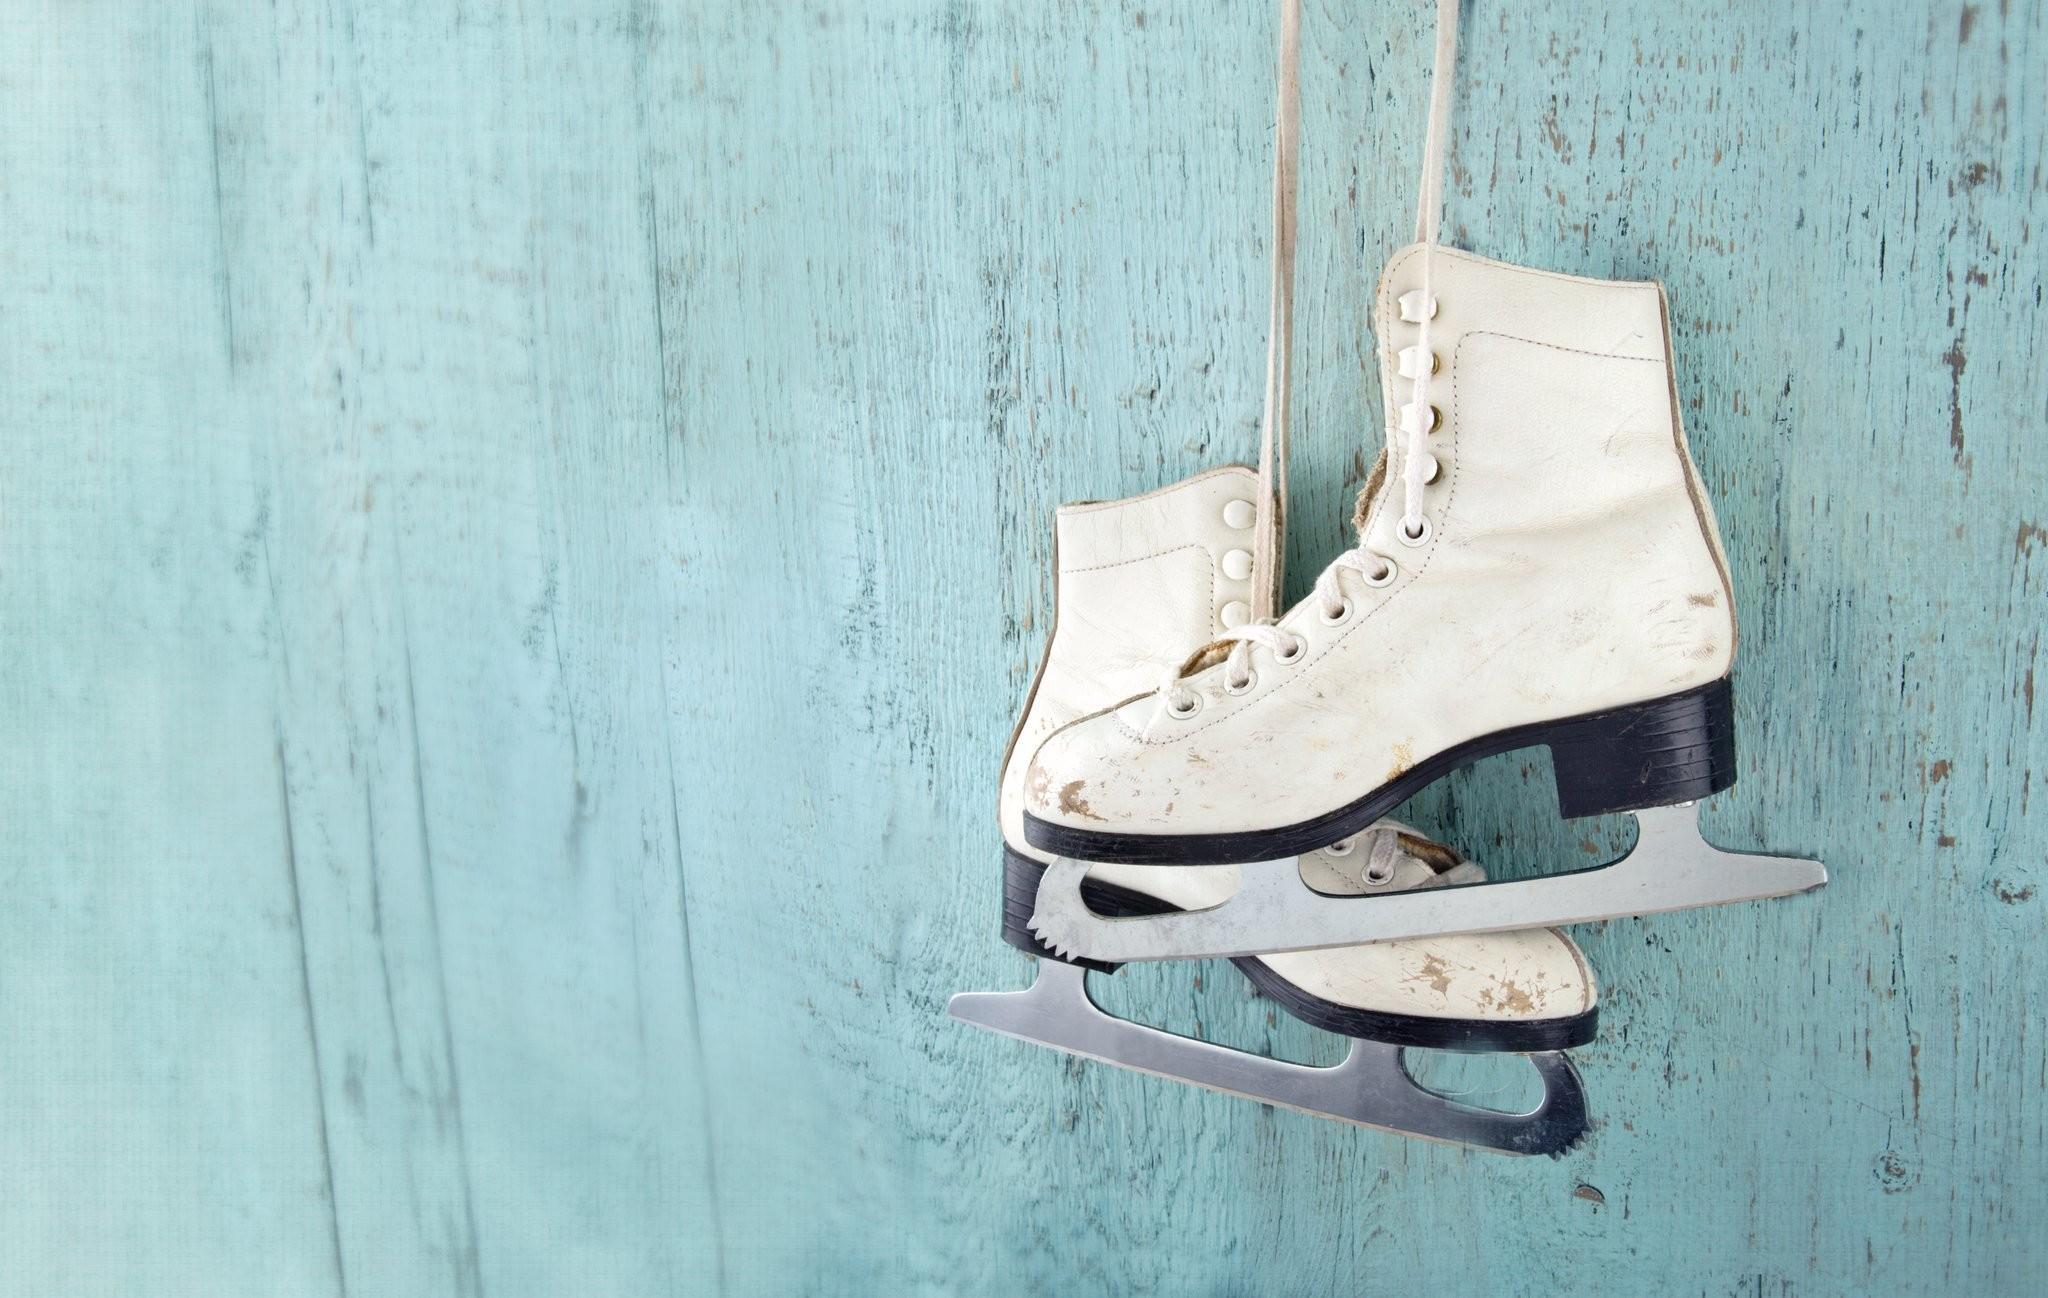 Ice Skating Desktop Wallpapers Wallpaper Cave